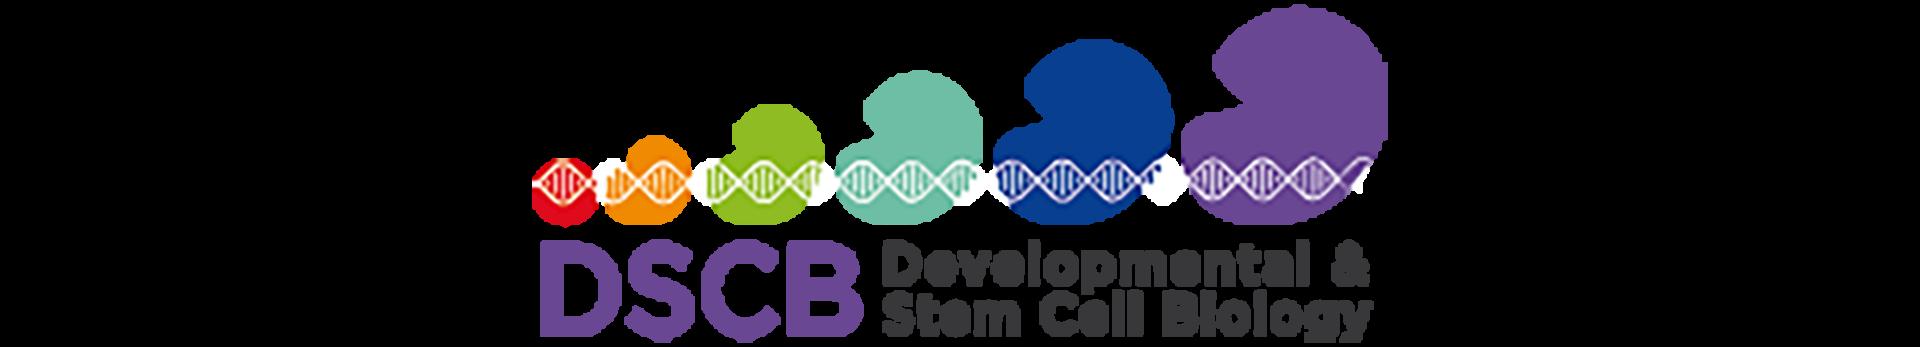 françois schweisguth developmental and stem cell biology